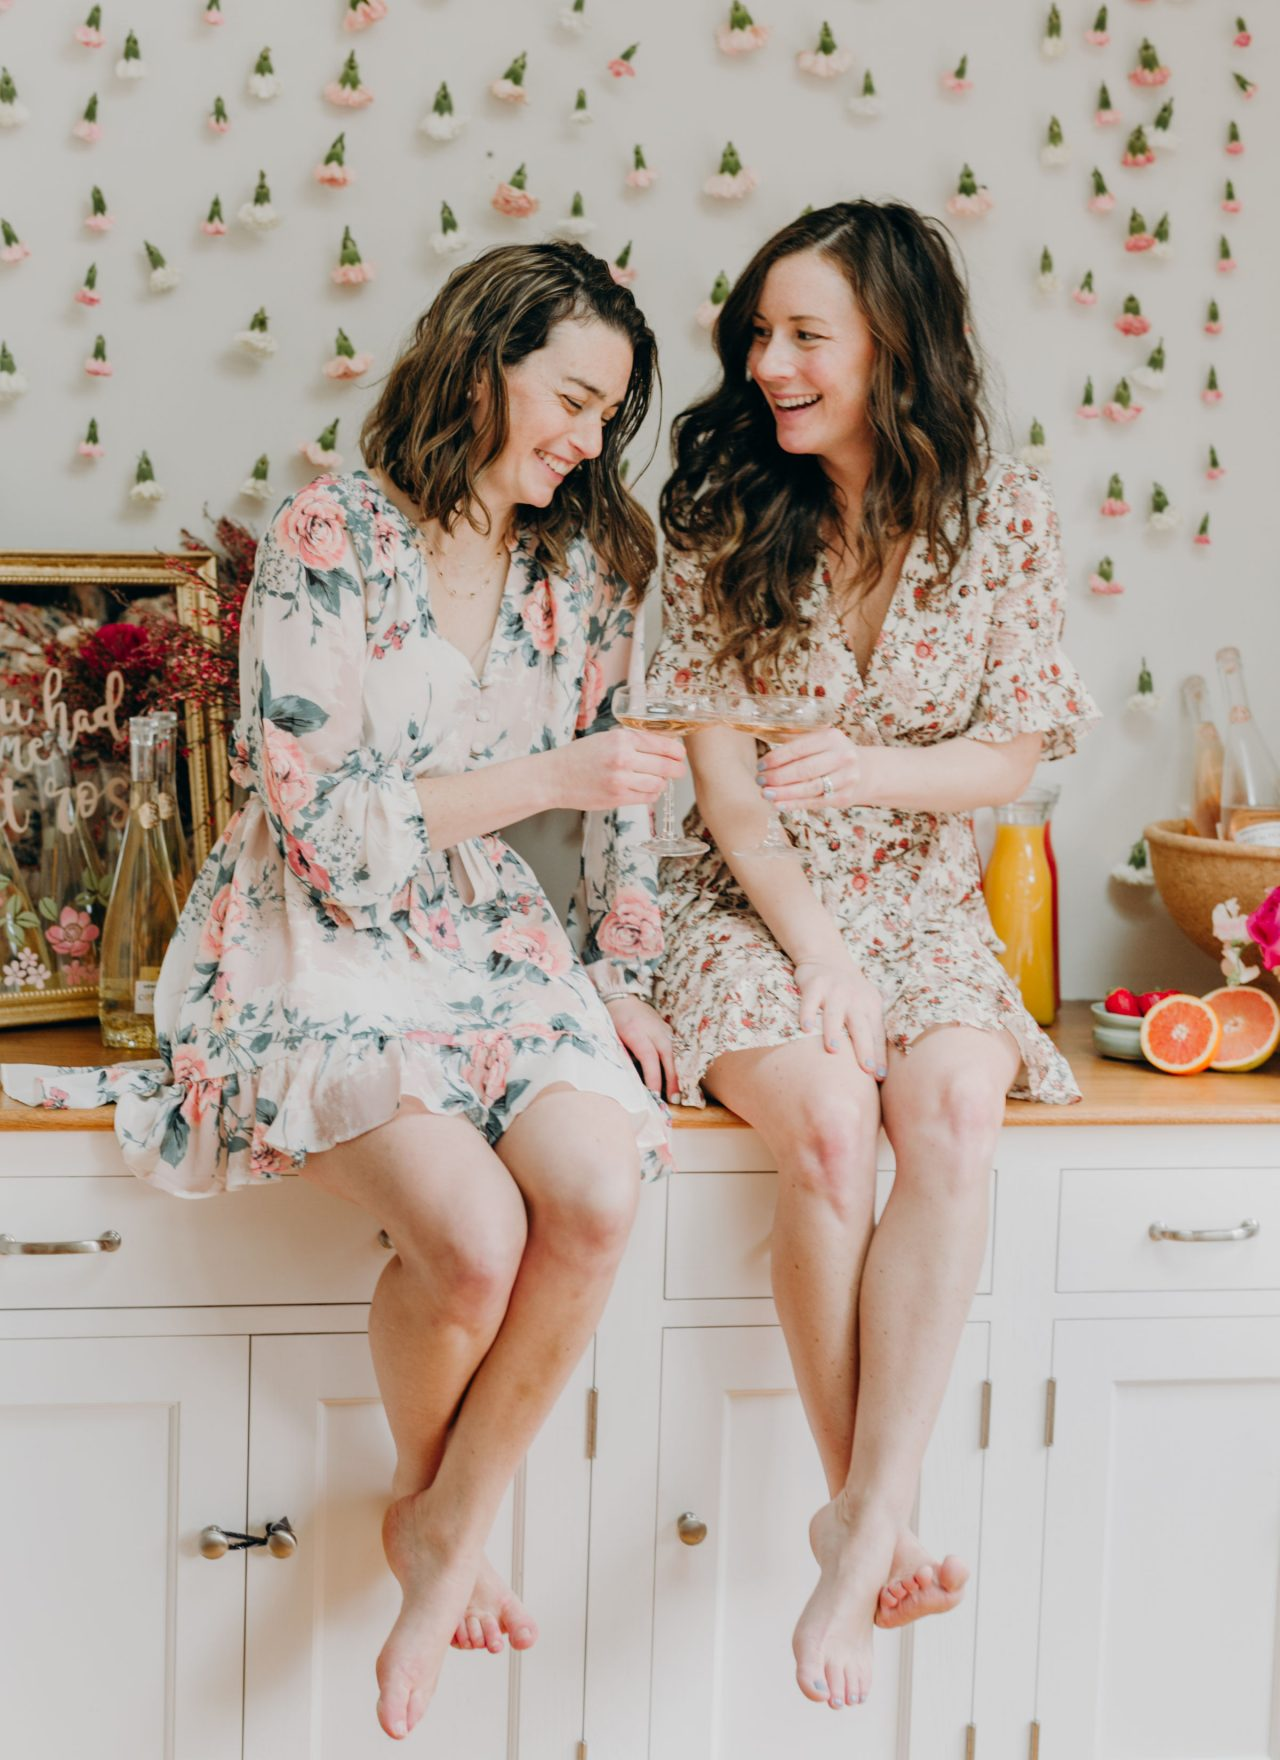 girls in floral dresses cheersing rose